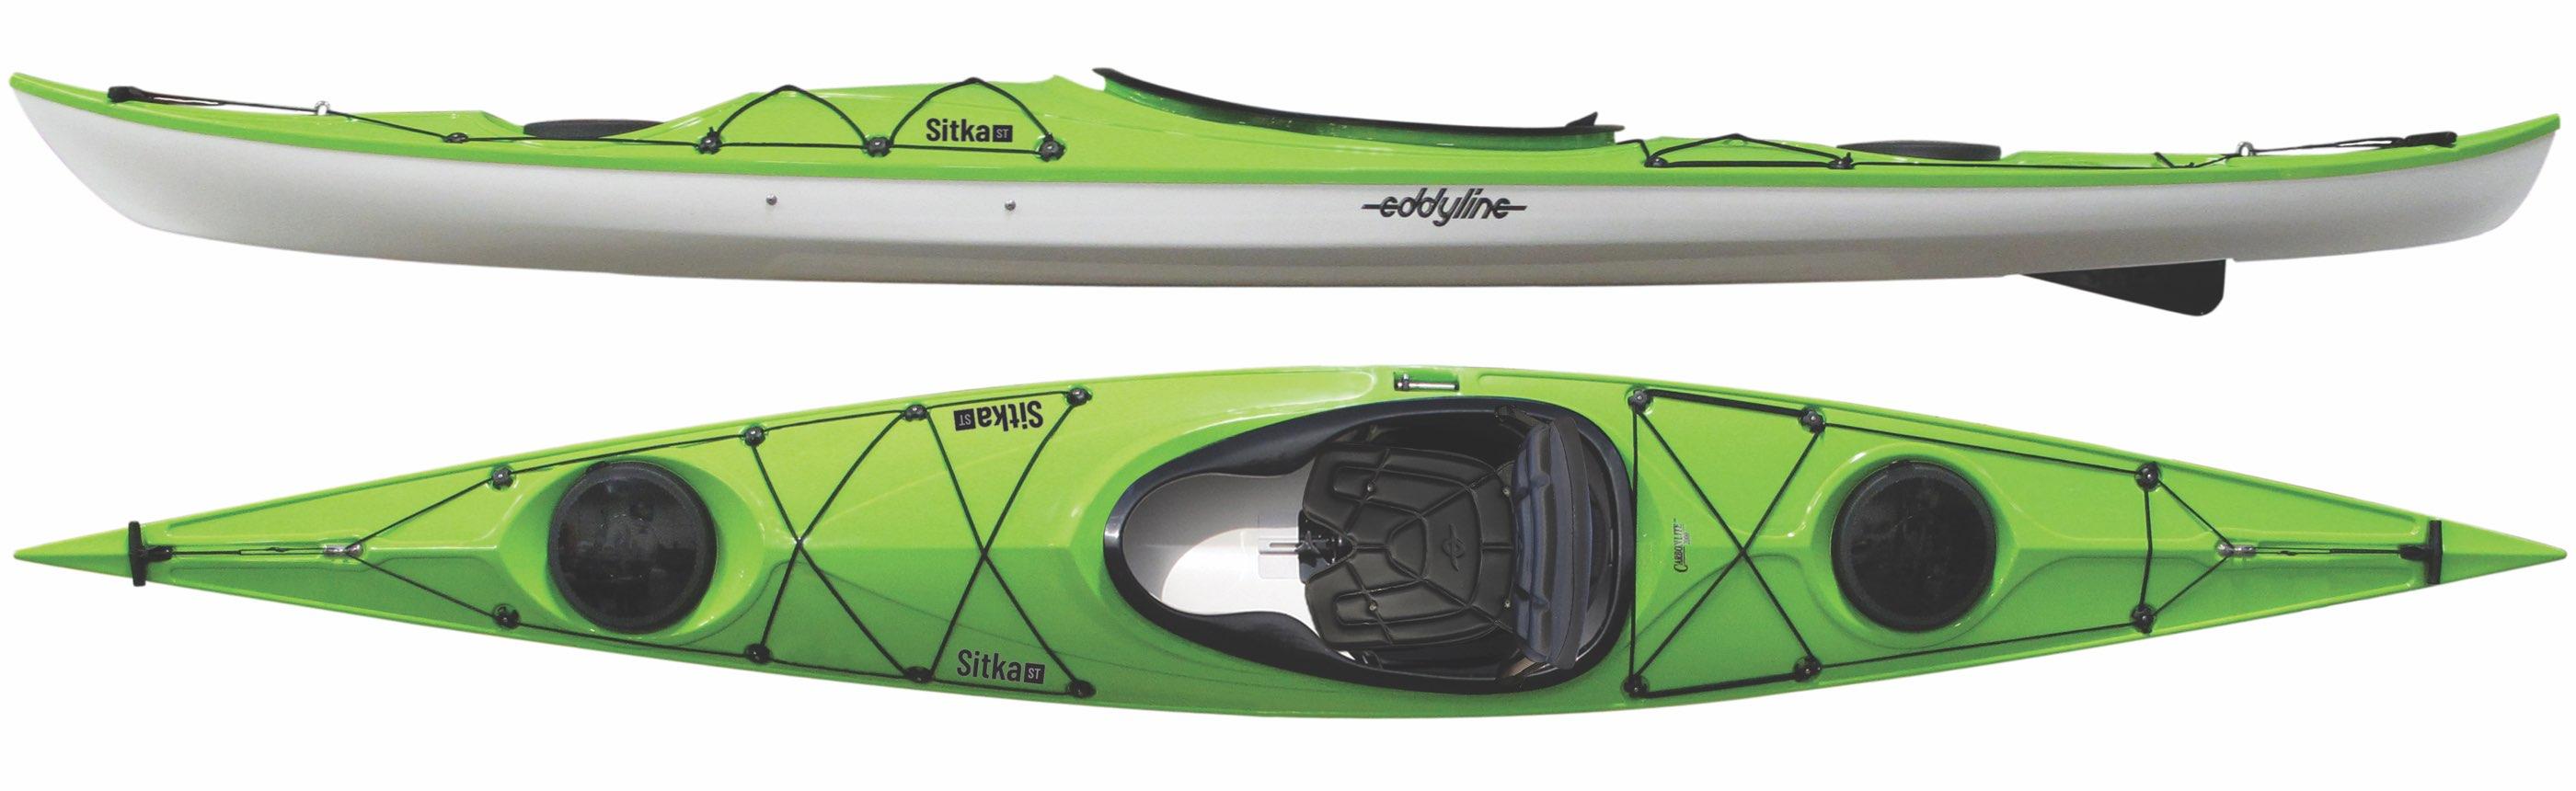 Kayaks: Sitka ST by Eddyline Kayaks - Image 3386